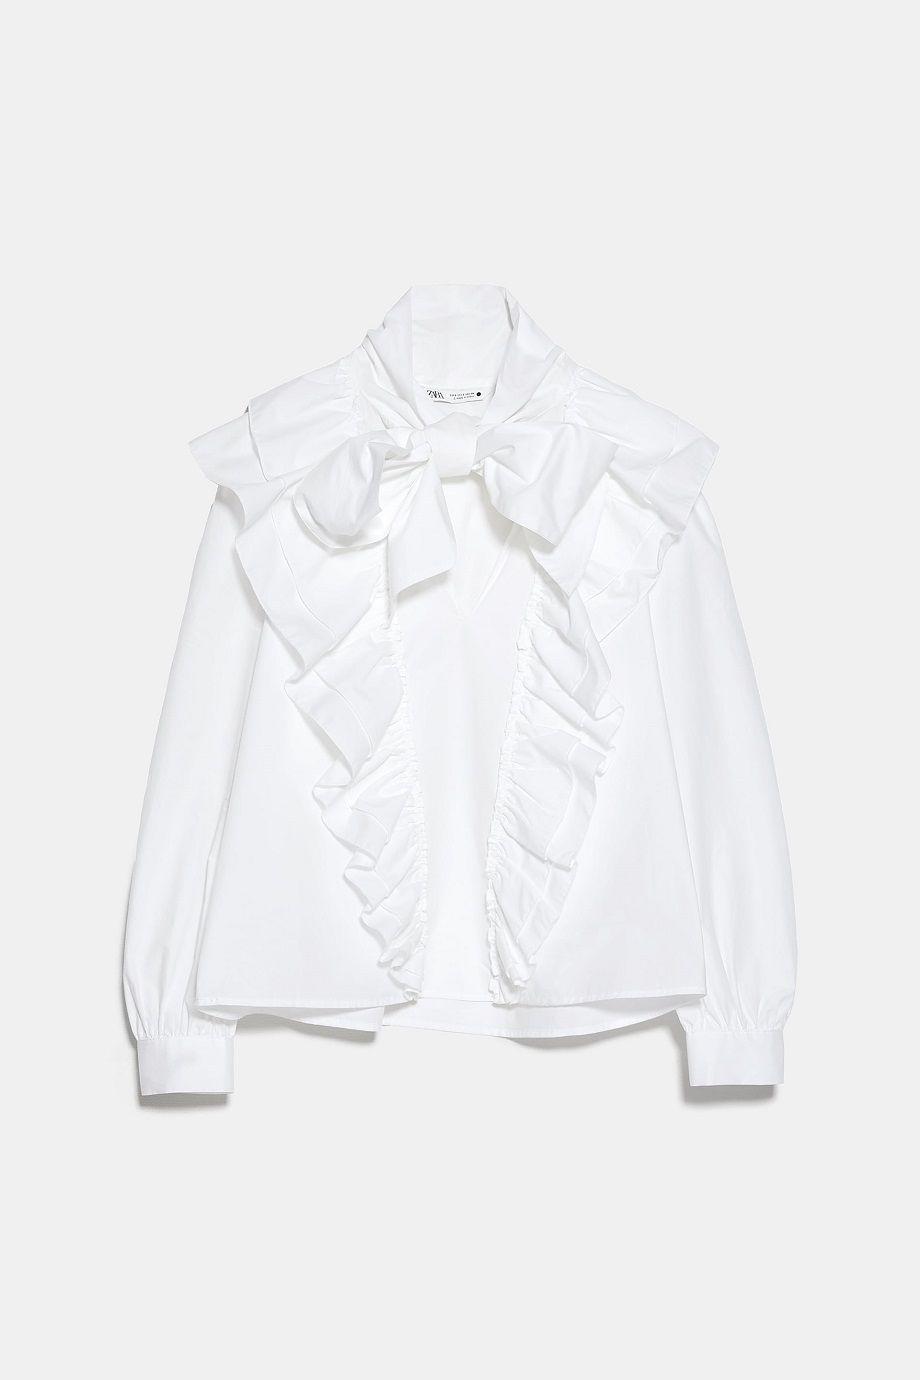 #PopbelaOOTD: Cantik dengan Busana Warna Putih